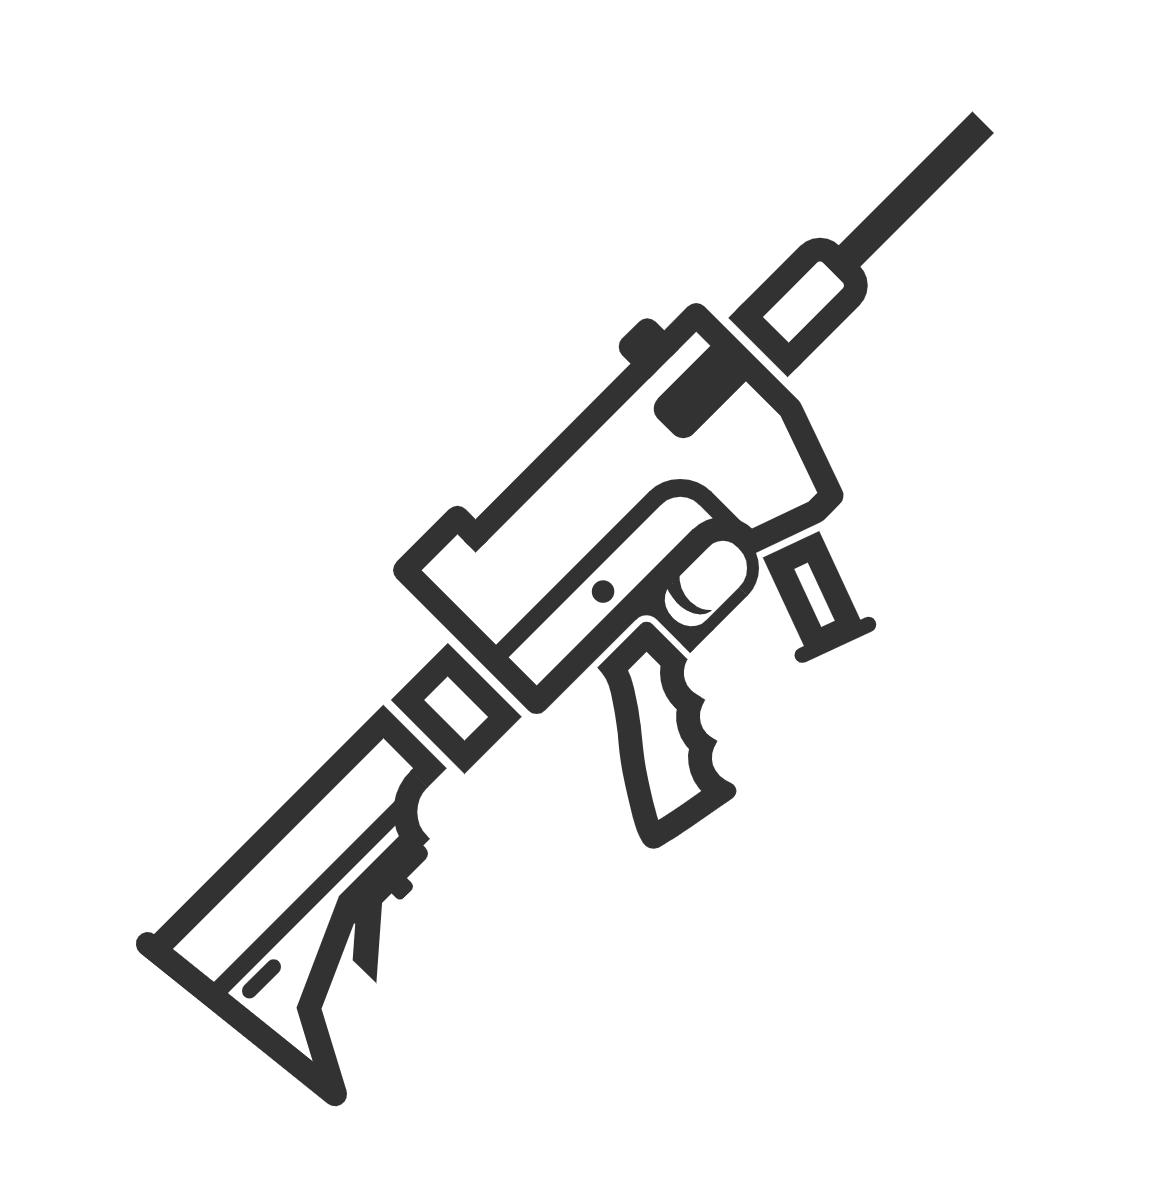 Epingle Sur Surviv Io Custom Concepts